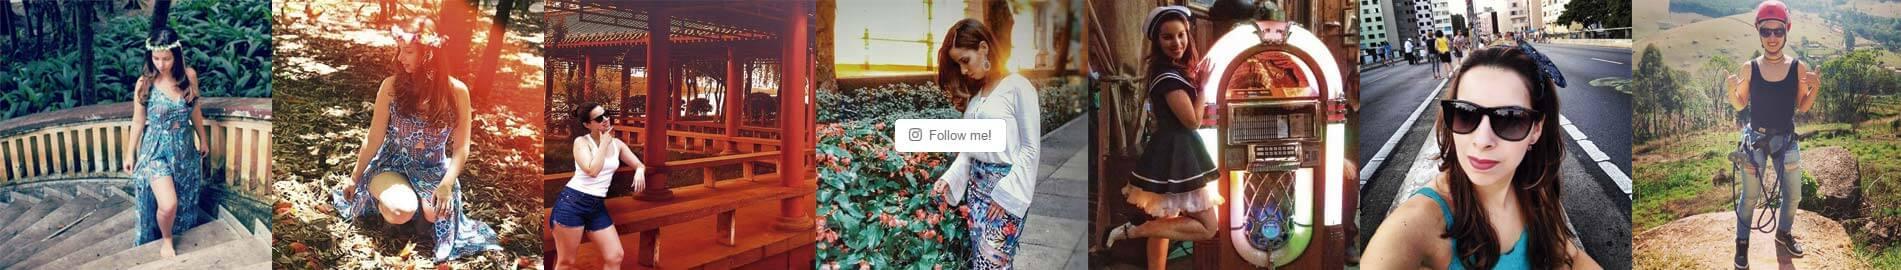 Instagram @DanielaCordeiroOficial